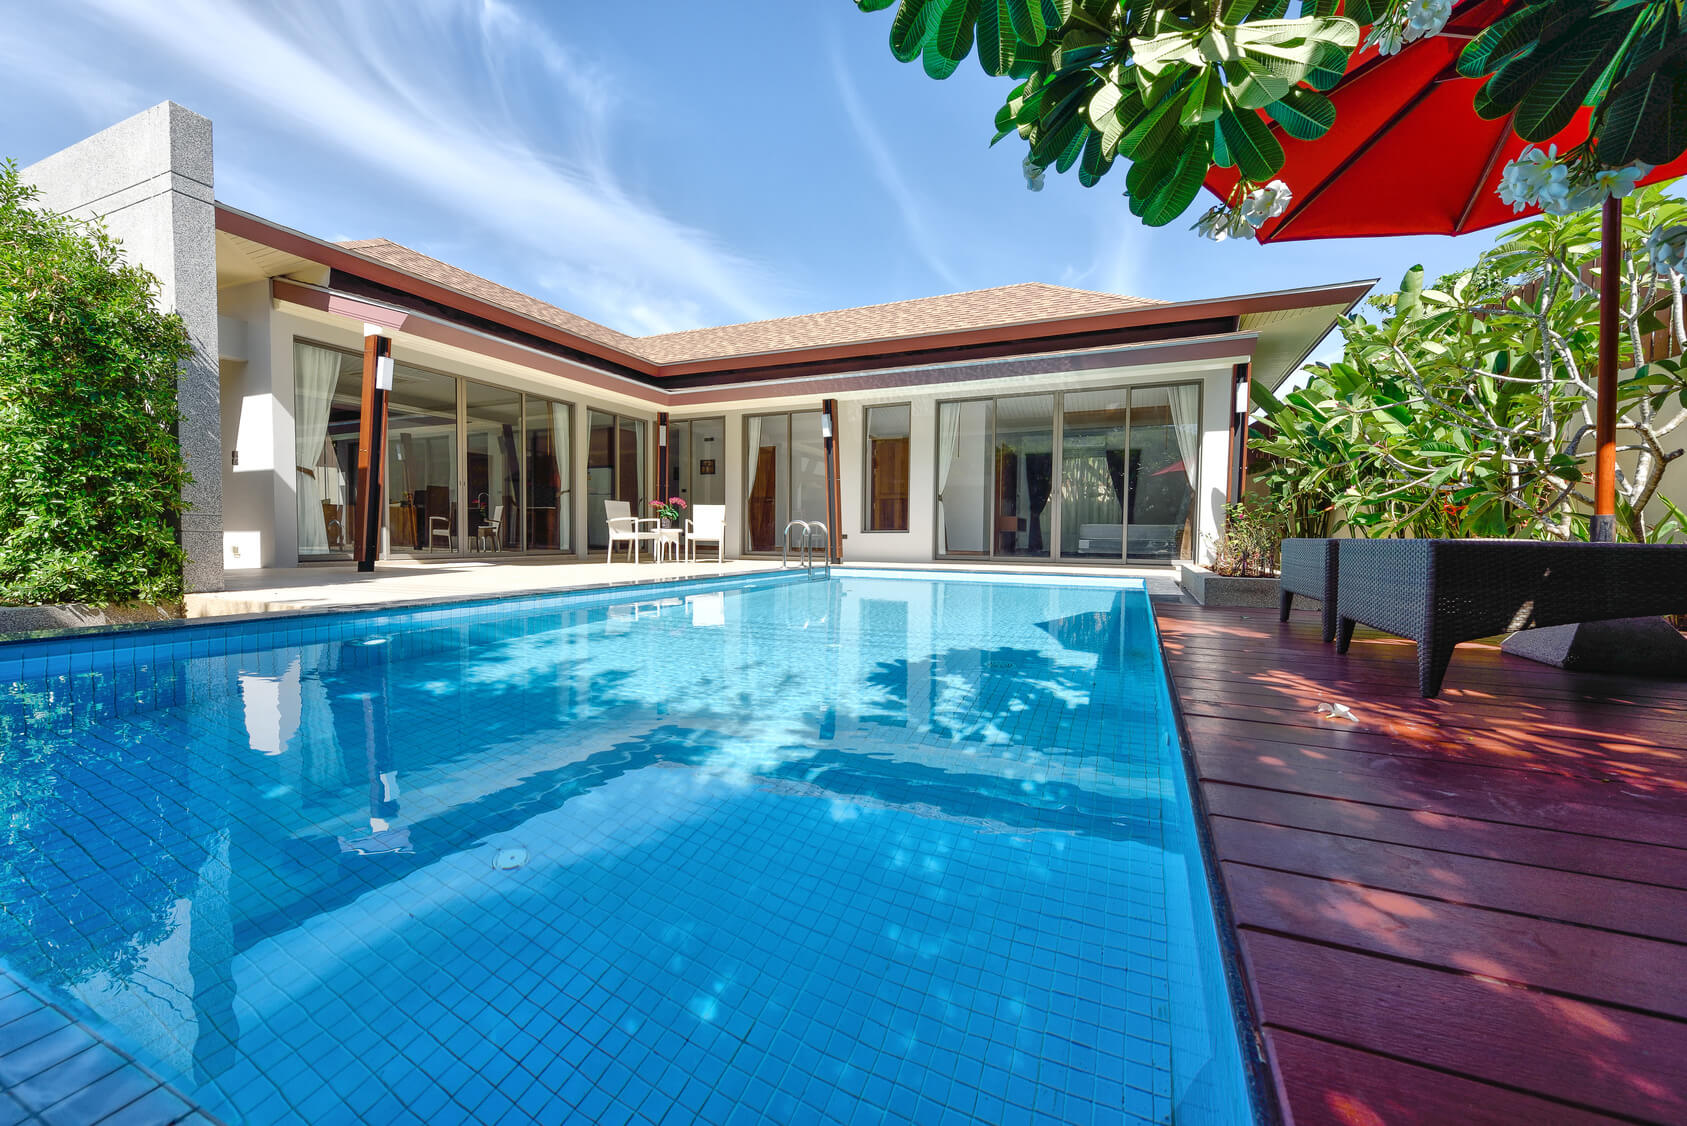 Assurance habitation garantie piscine